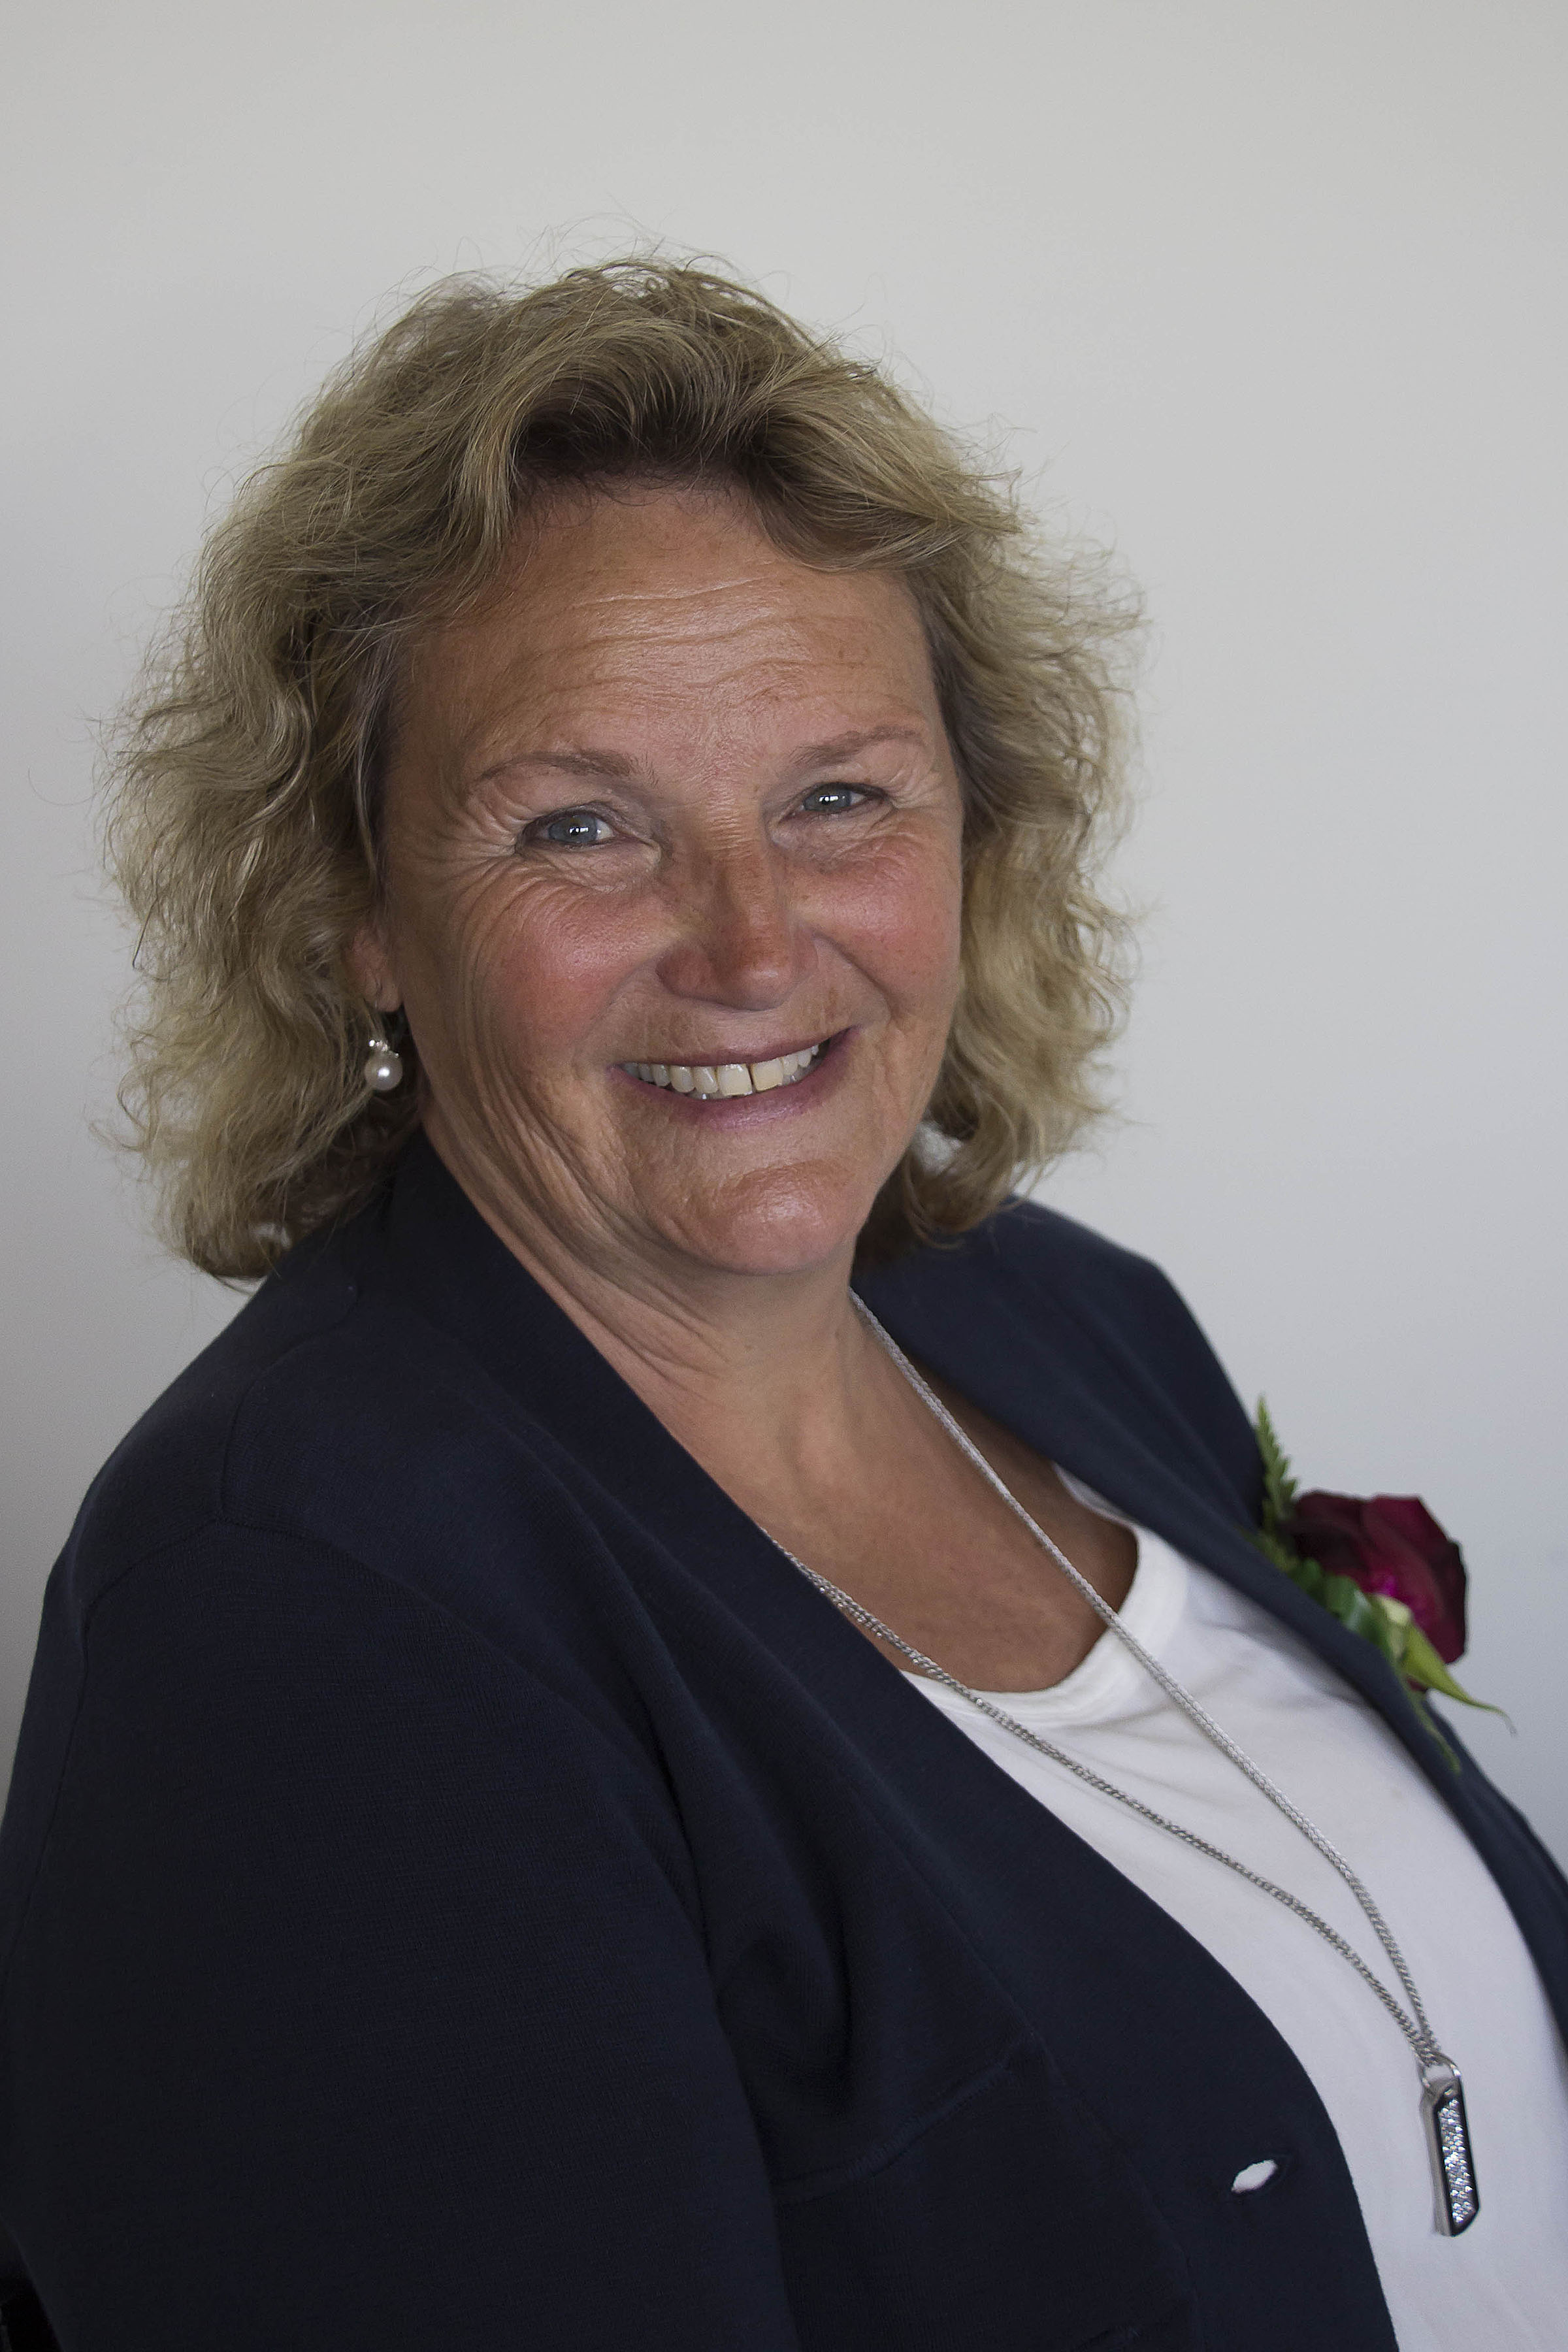 Deputy Mayor Helen Lash